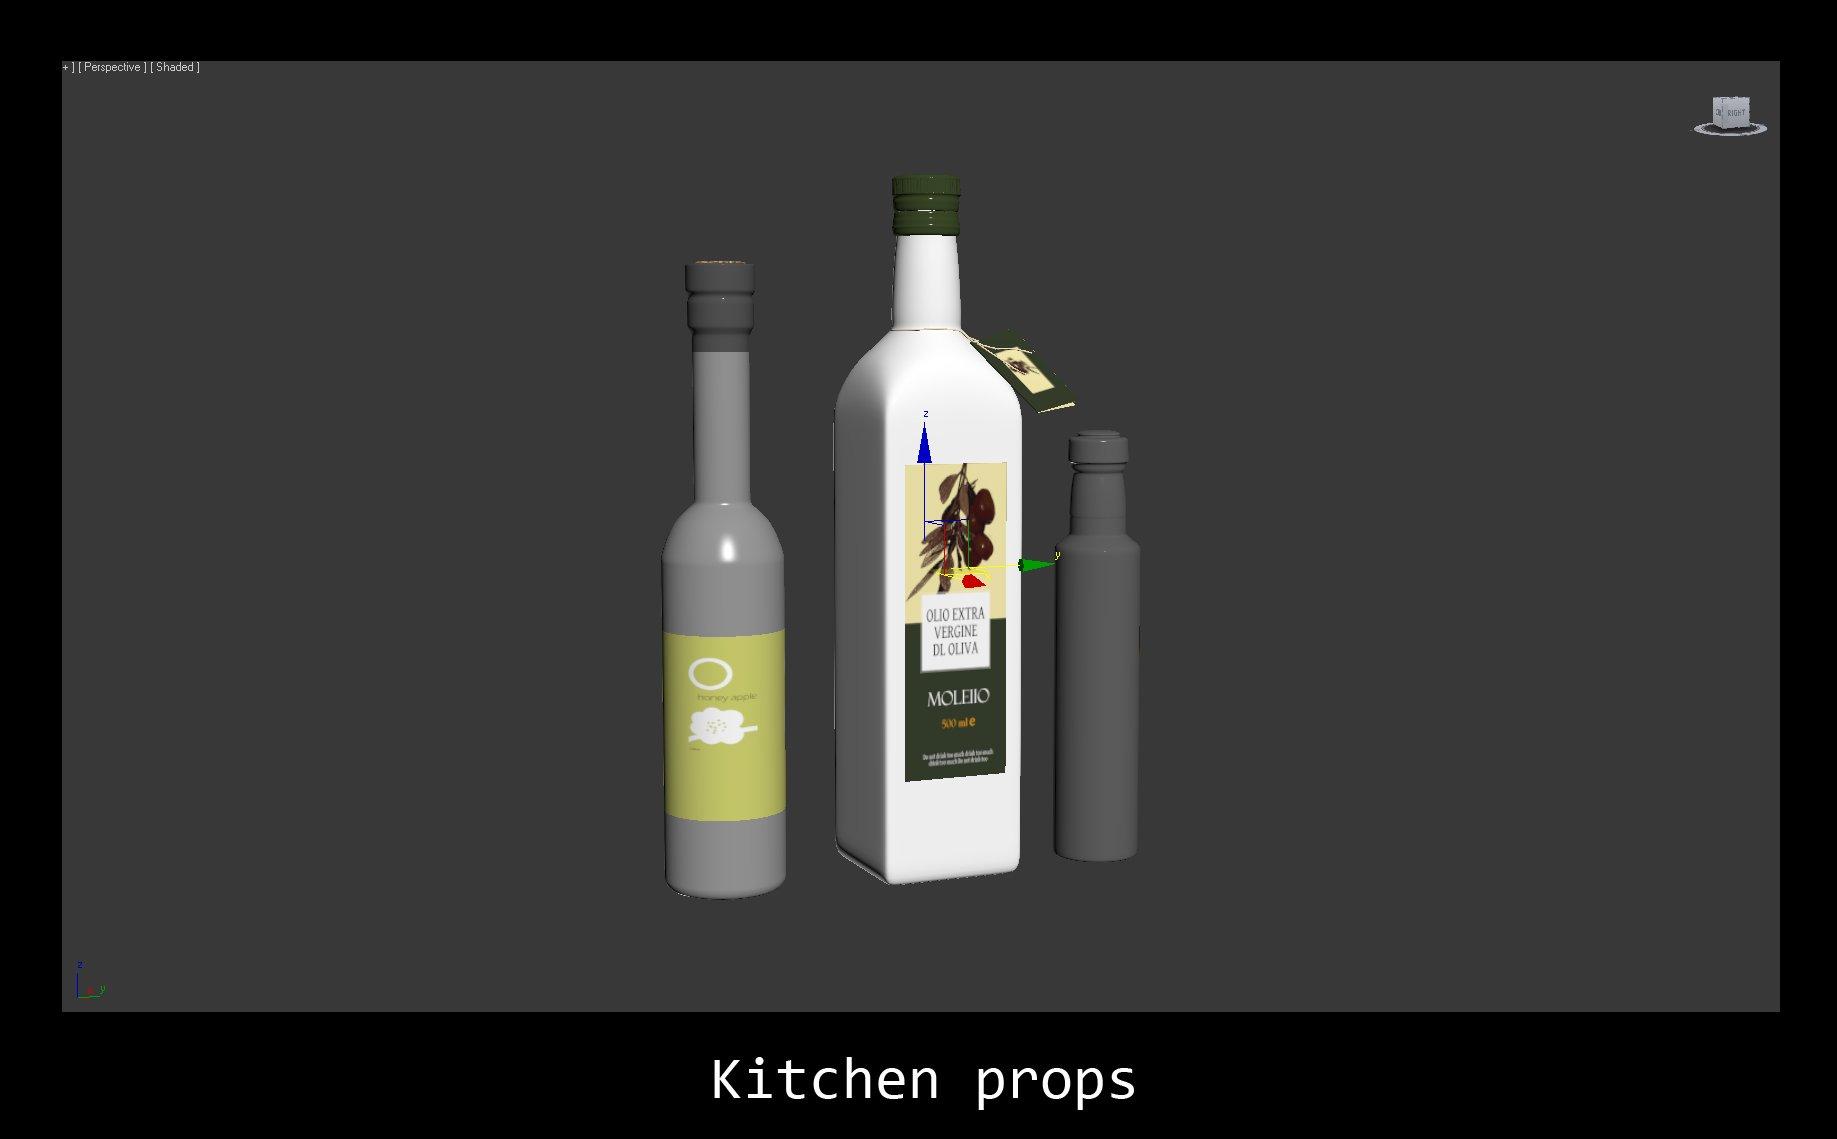 07_Kitchen_props_evermotion.jpg